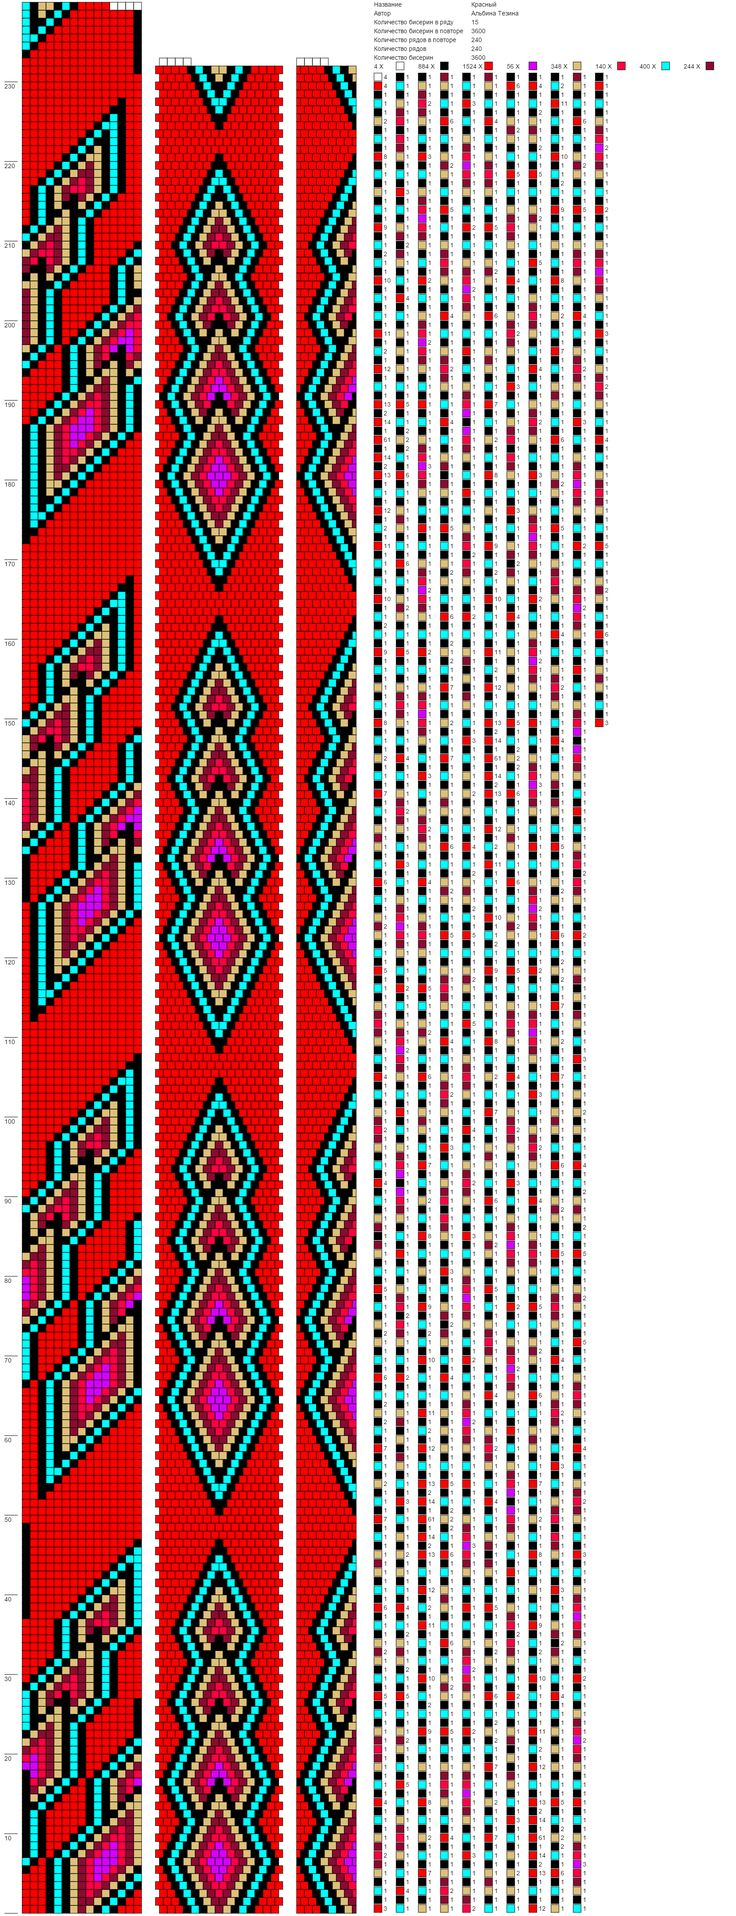 Krasny.png (1663×4331)